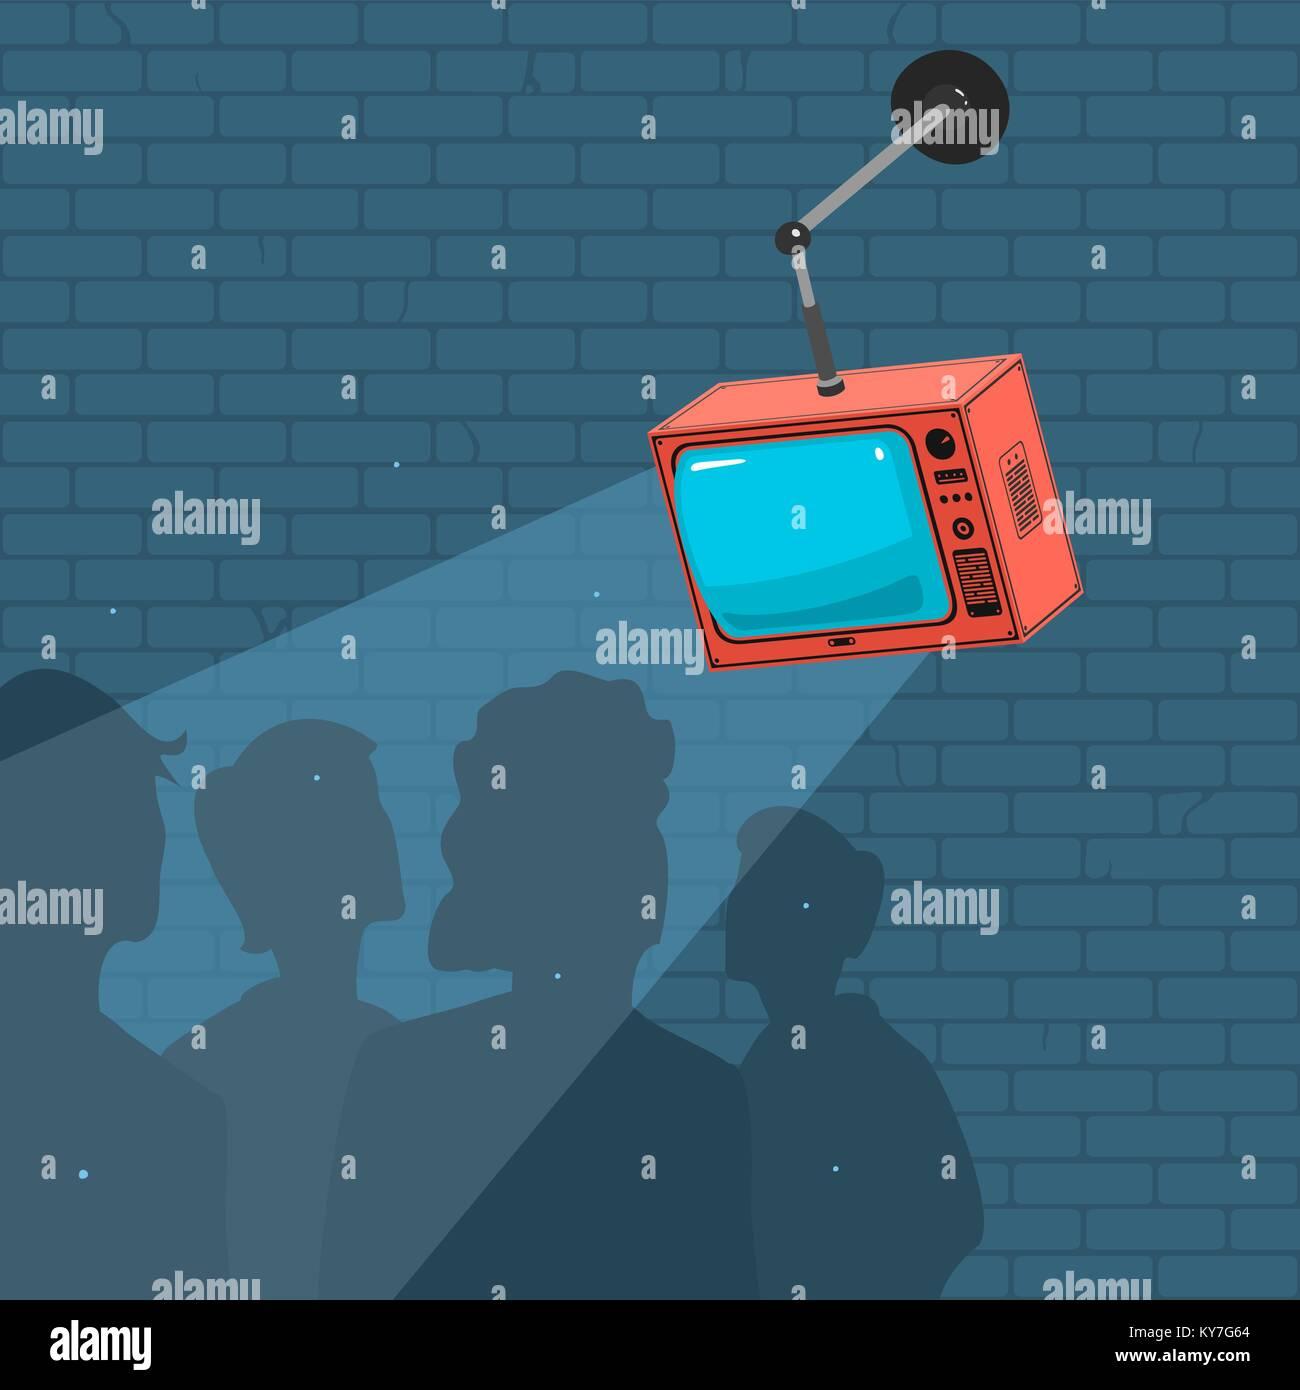 People Watch TV And Propaganda - Stock Vector